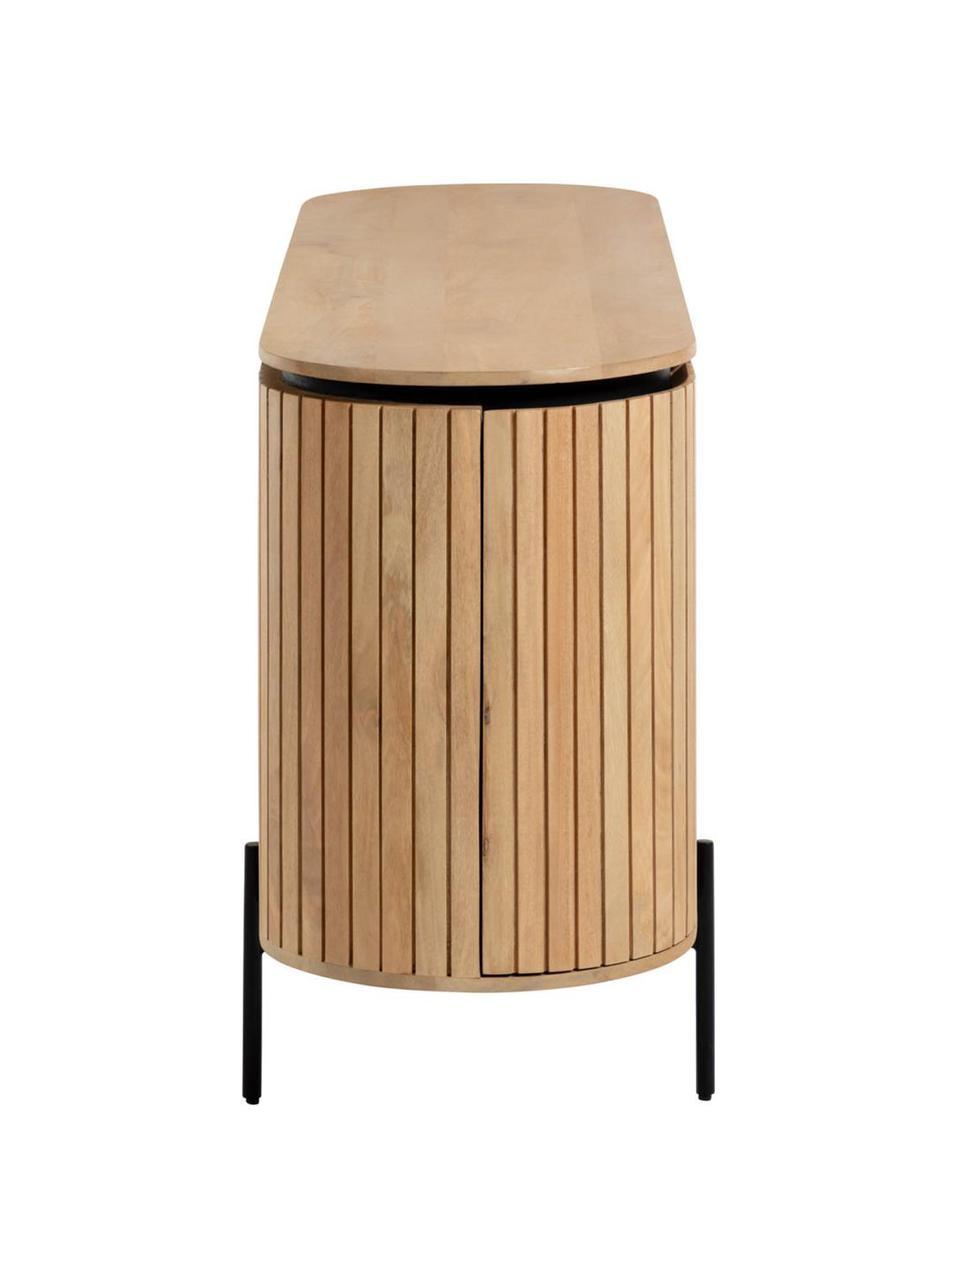 Sideboard Licia mit Türen aus Mangoholz, Korpus: Mangoholz, per Hand polie, Füße: Metall, lackiert, Beige, Schwarz, 170 x 80 cm